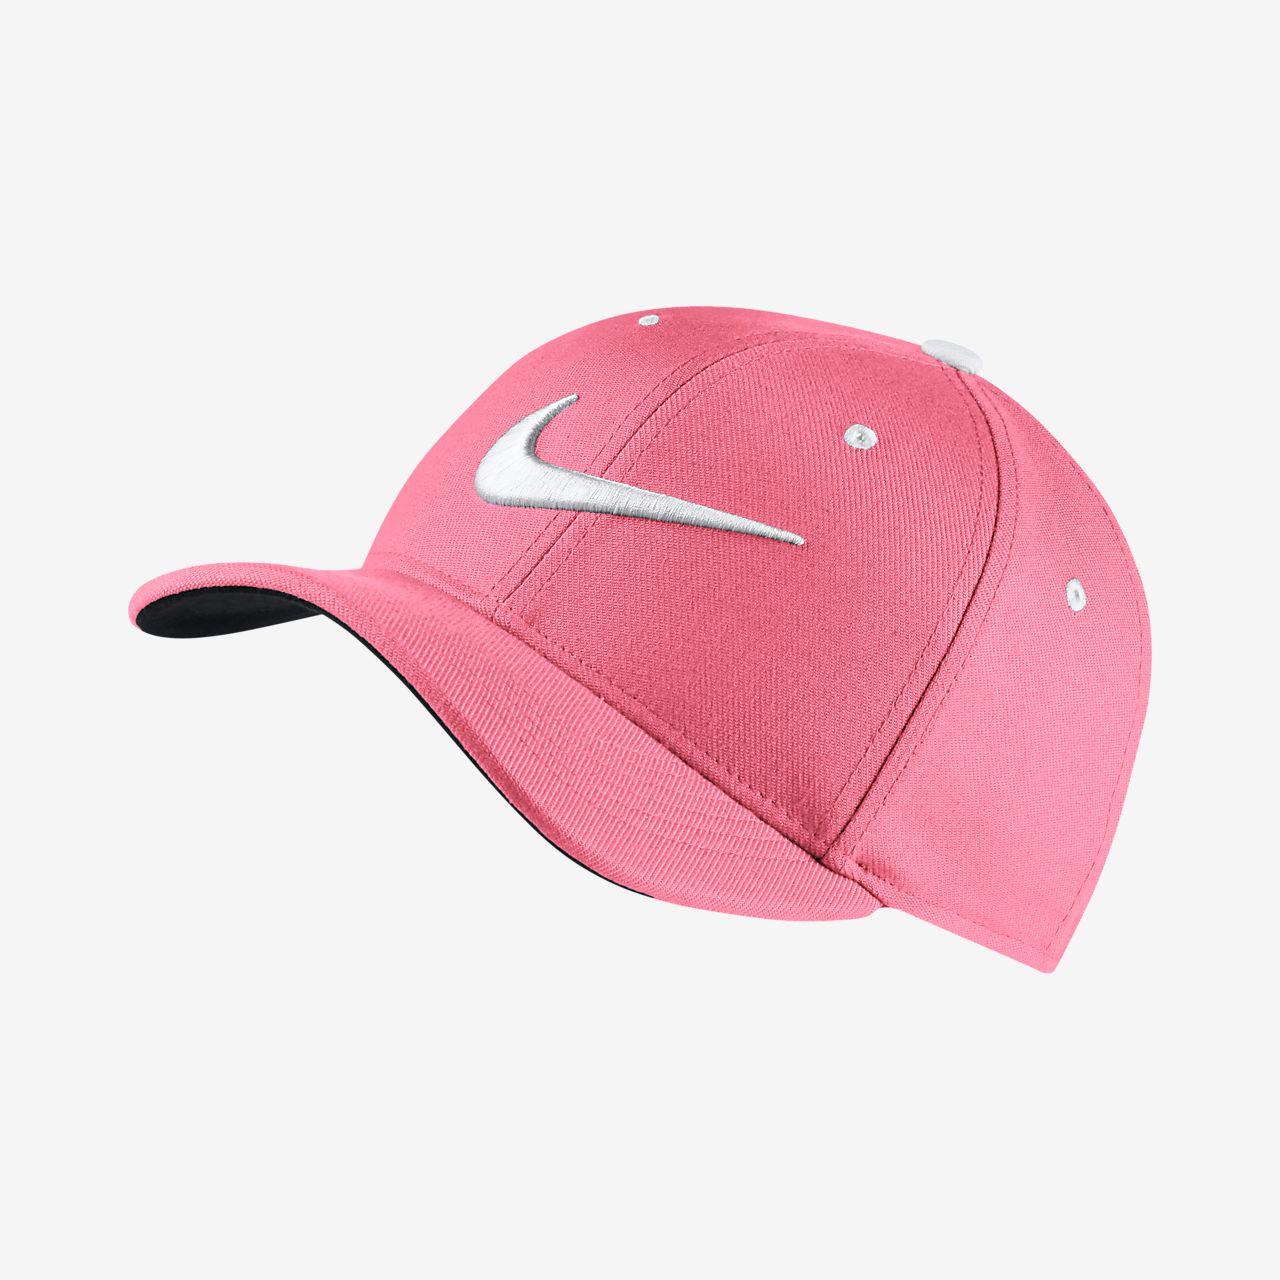 e2193f64f Nike AeroBill Classic 99 Older Kids' Training Cap